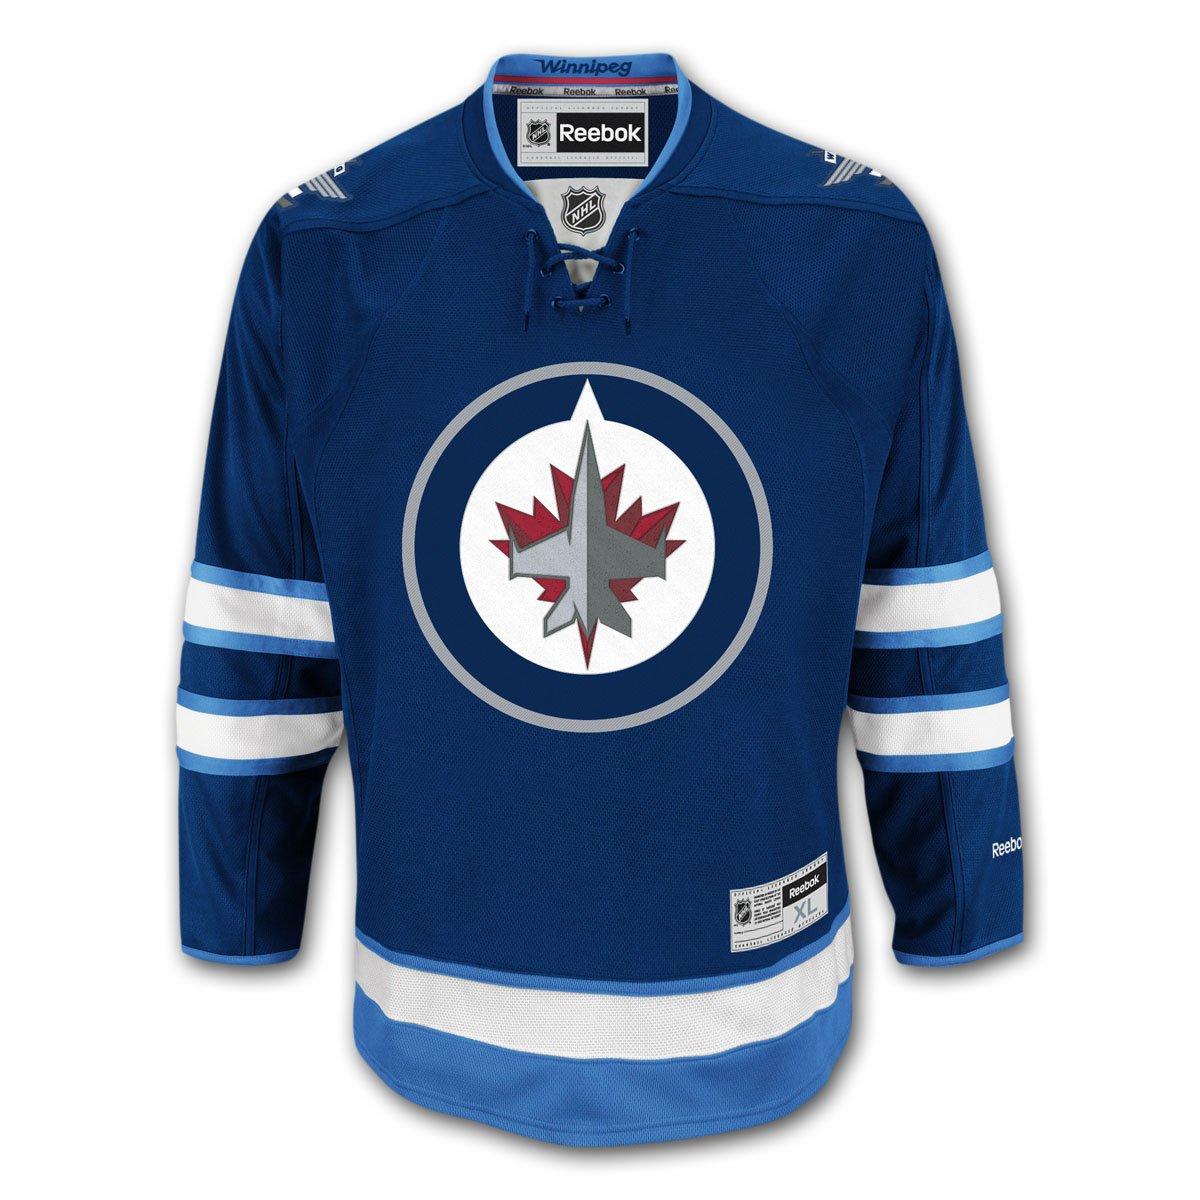 447ccd9efbb Winnipeg Jets Reebok Premier Youth Replica Home NHL Hockey Jersey - Size  Large   X-Large